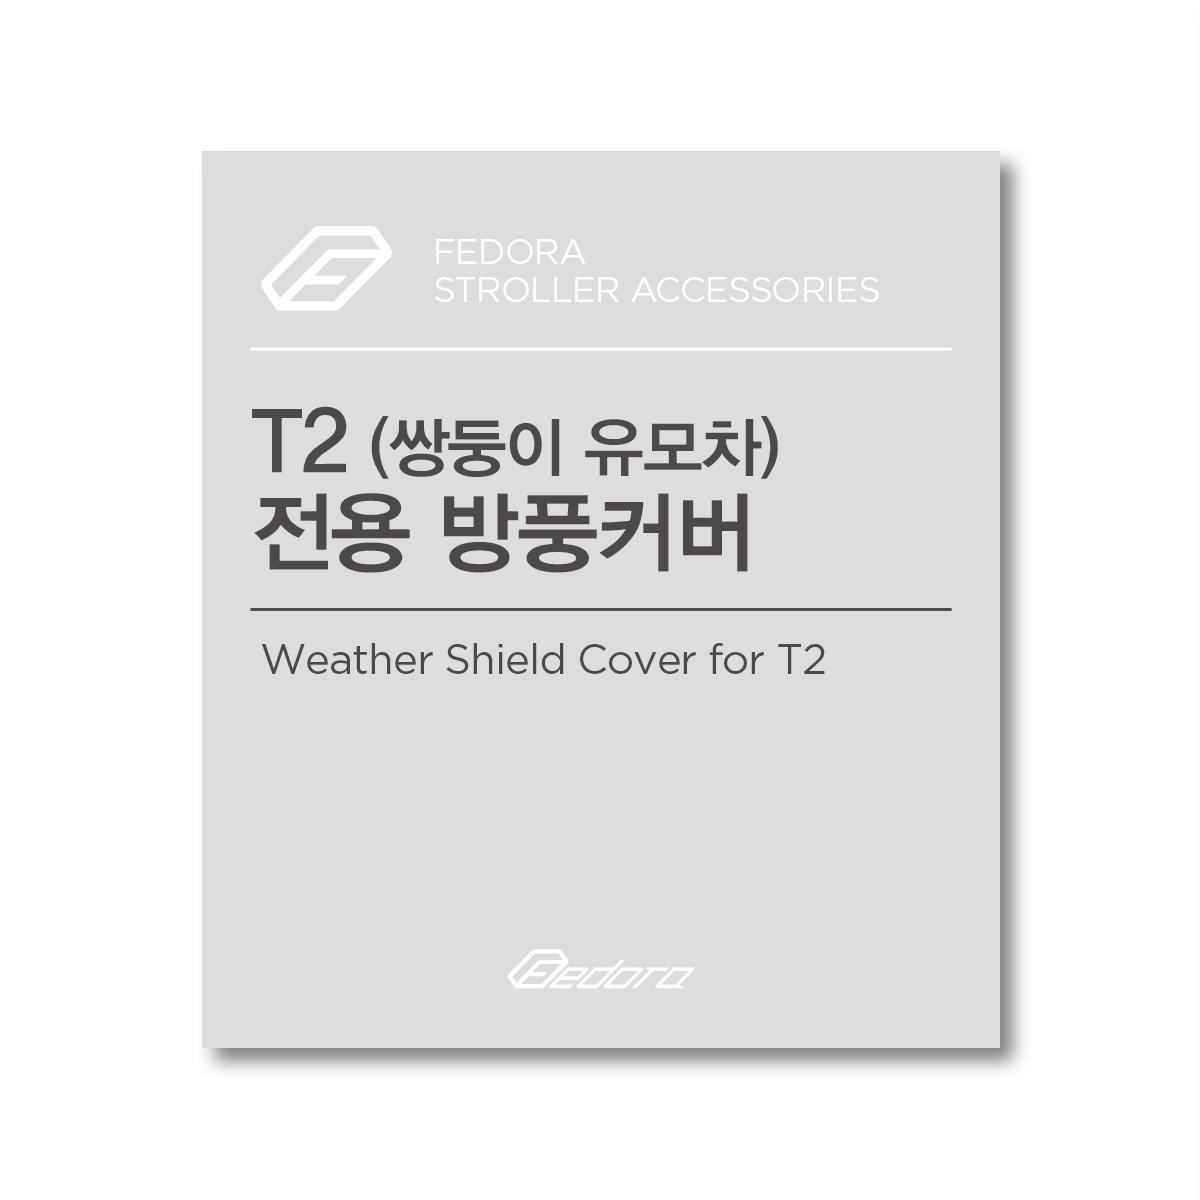 T2 전용 방풍커버